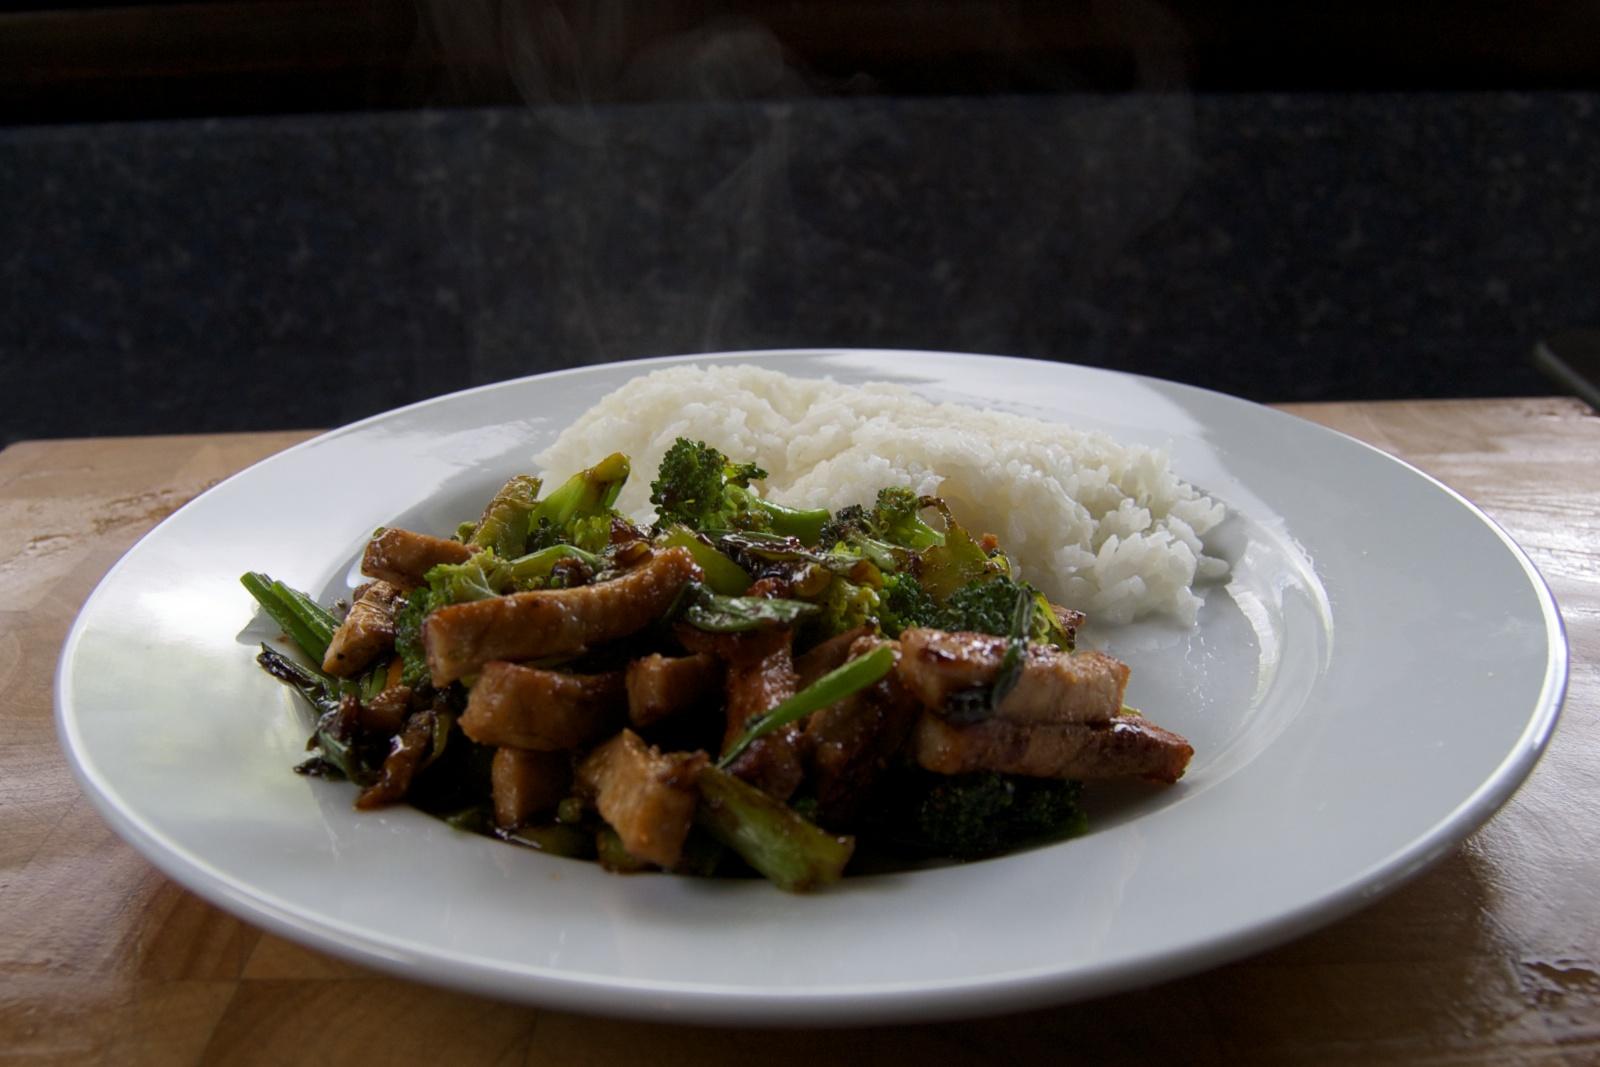 http://blog.rickk.com/food/2012/05/31/ate.2012.05.31.l.jpg